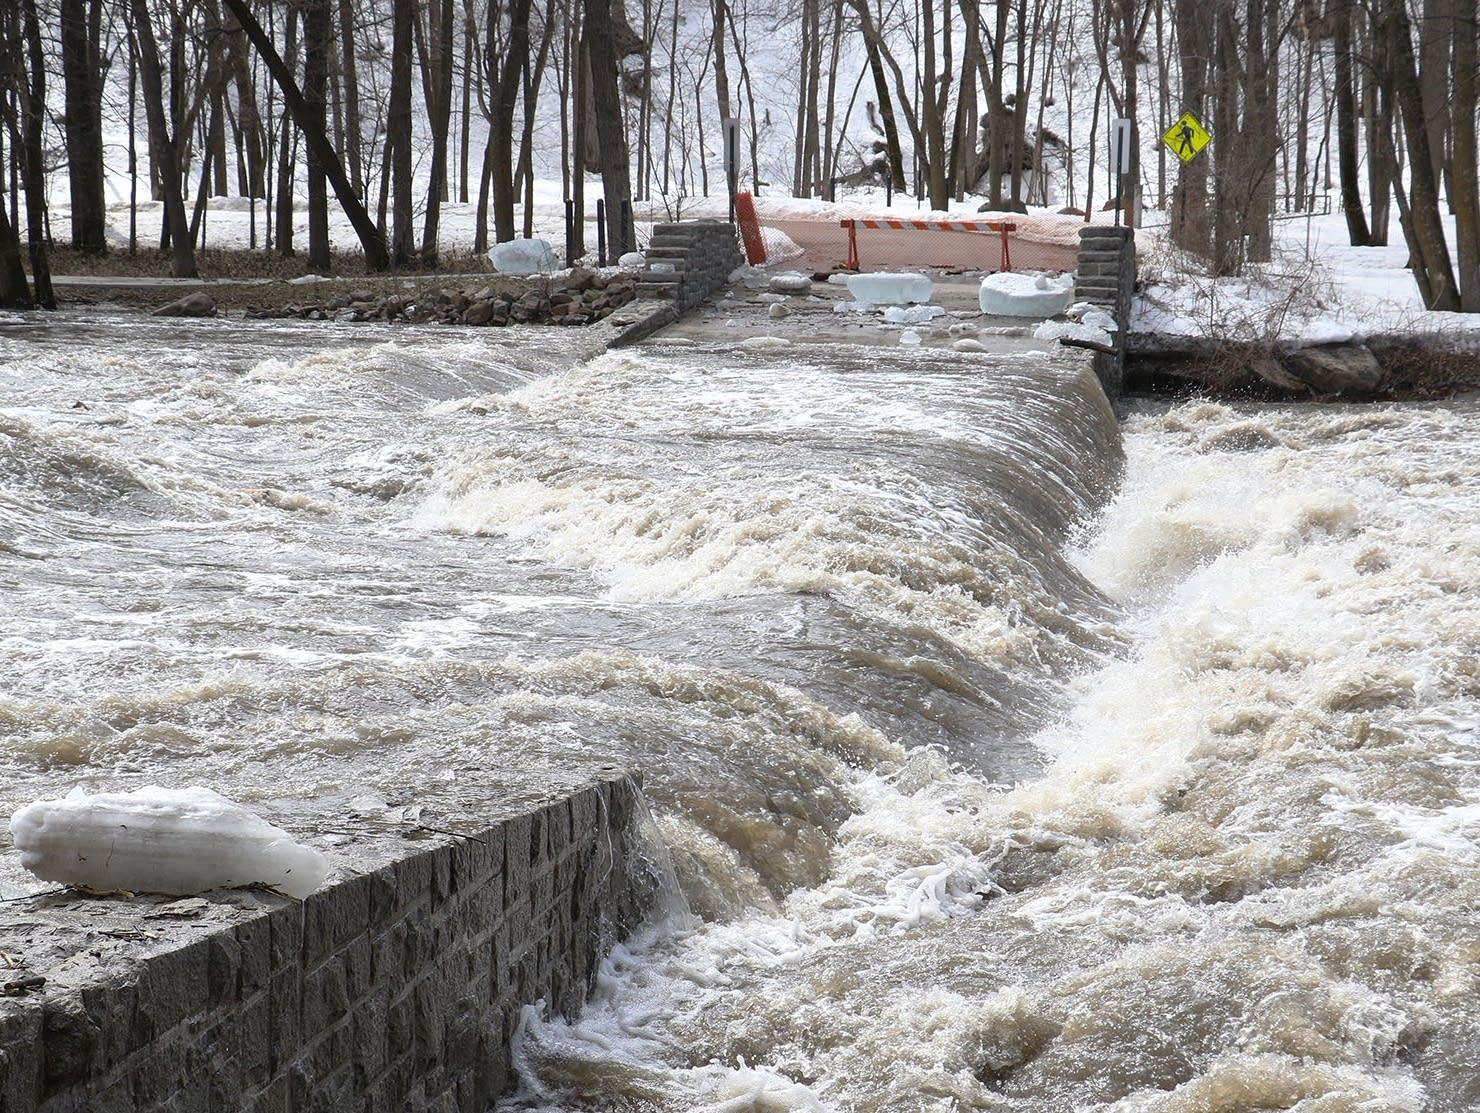 Redwood River in flood stage